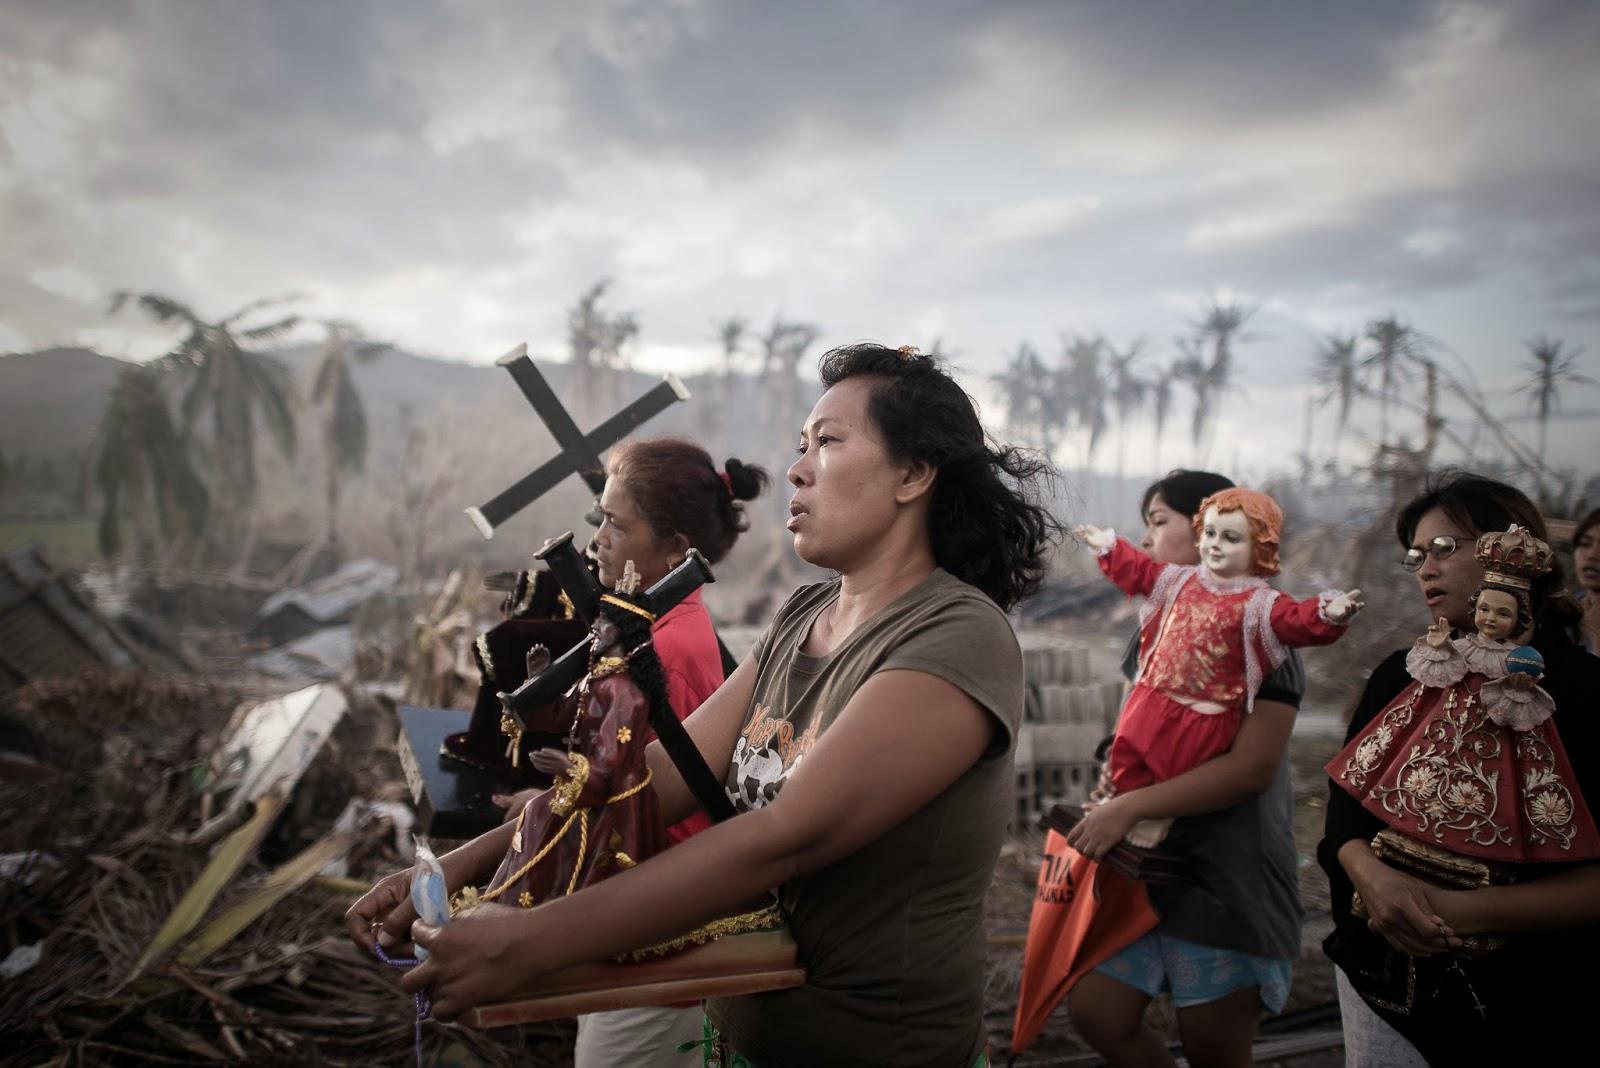 World Press Photo, Philiipe Lopez